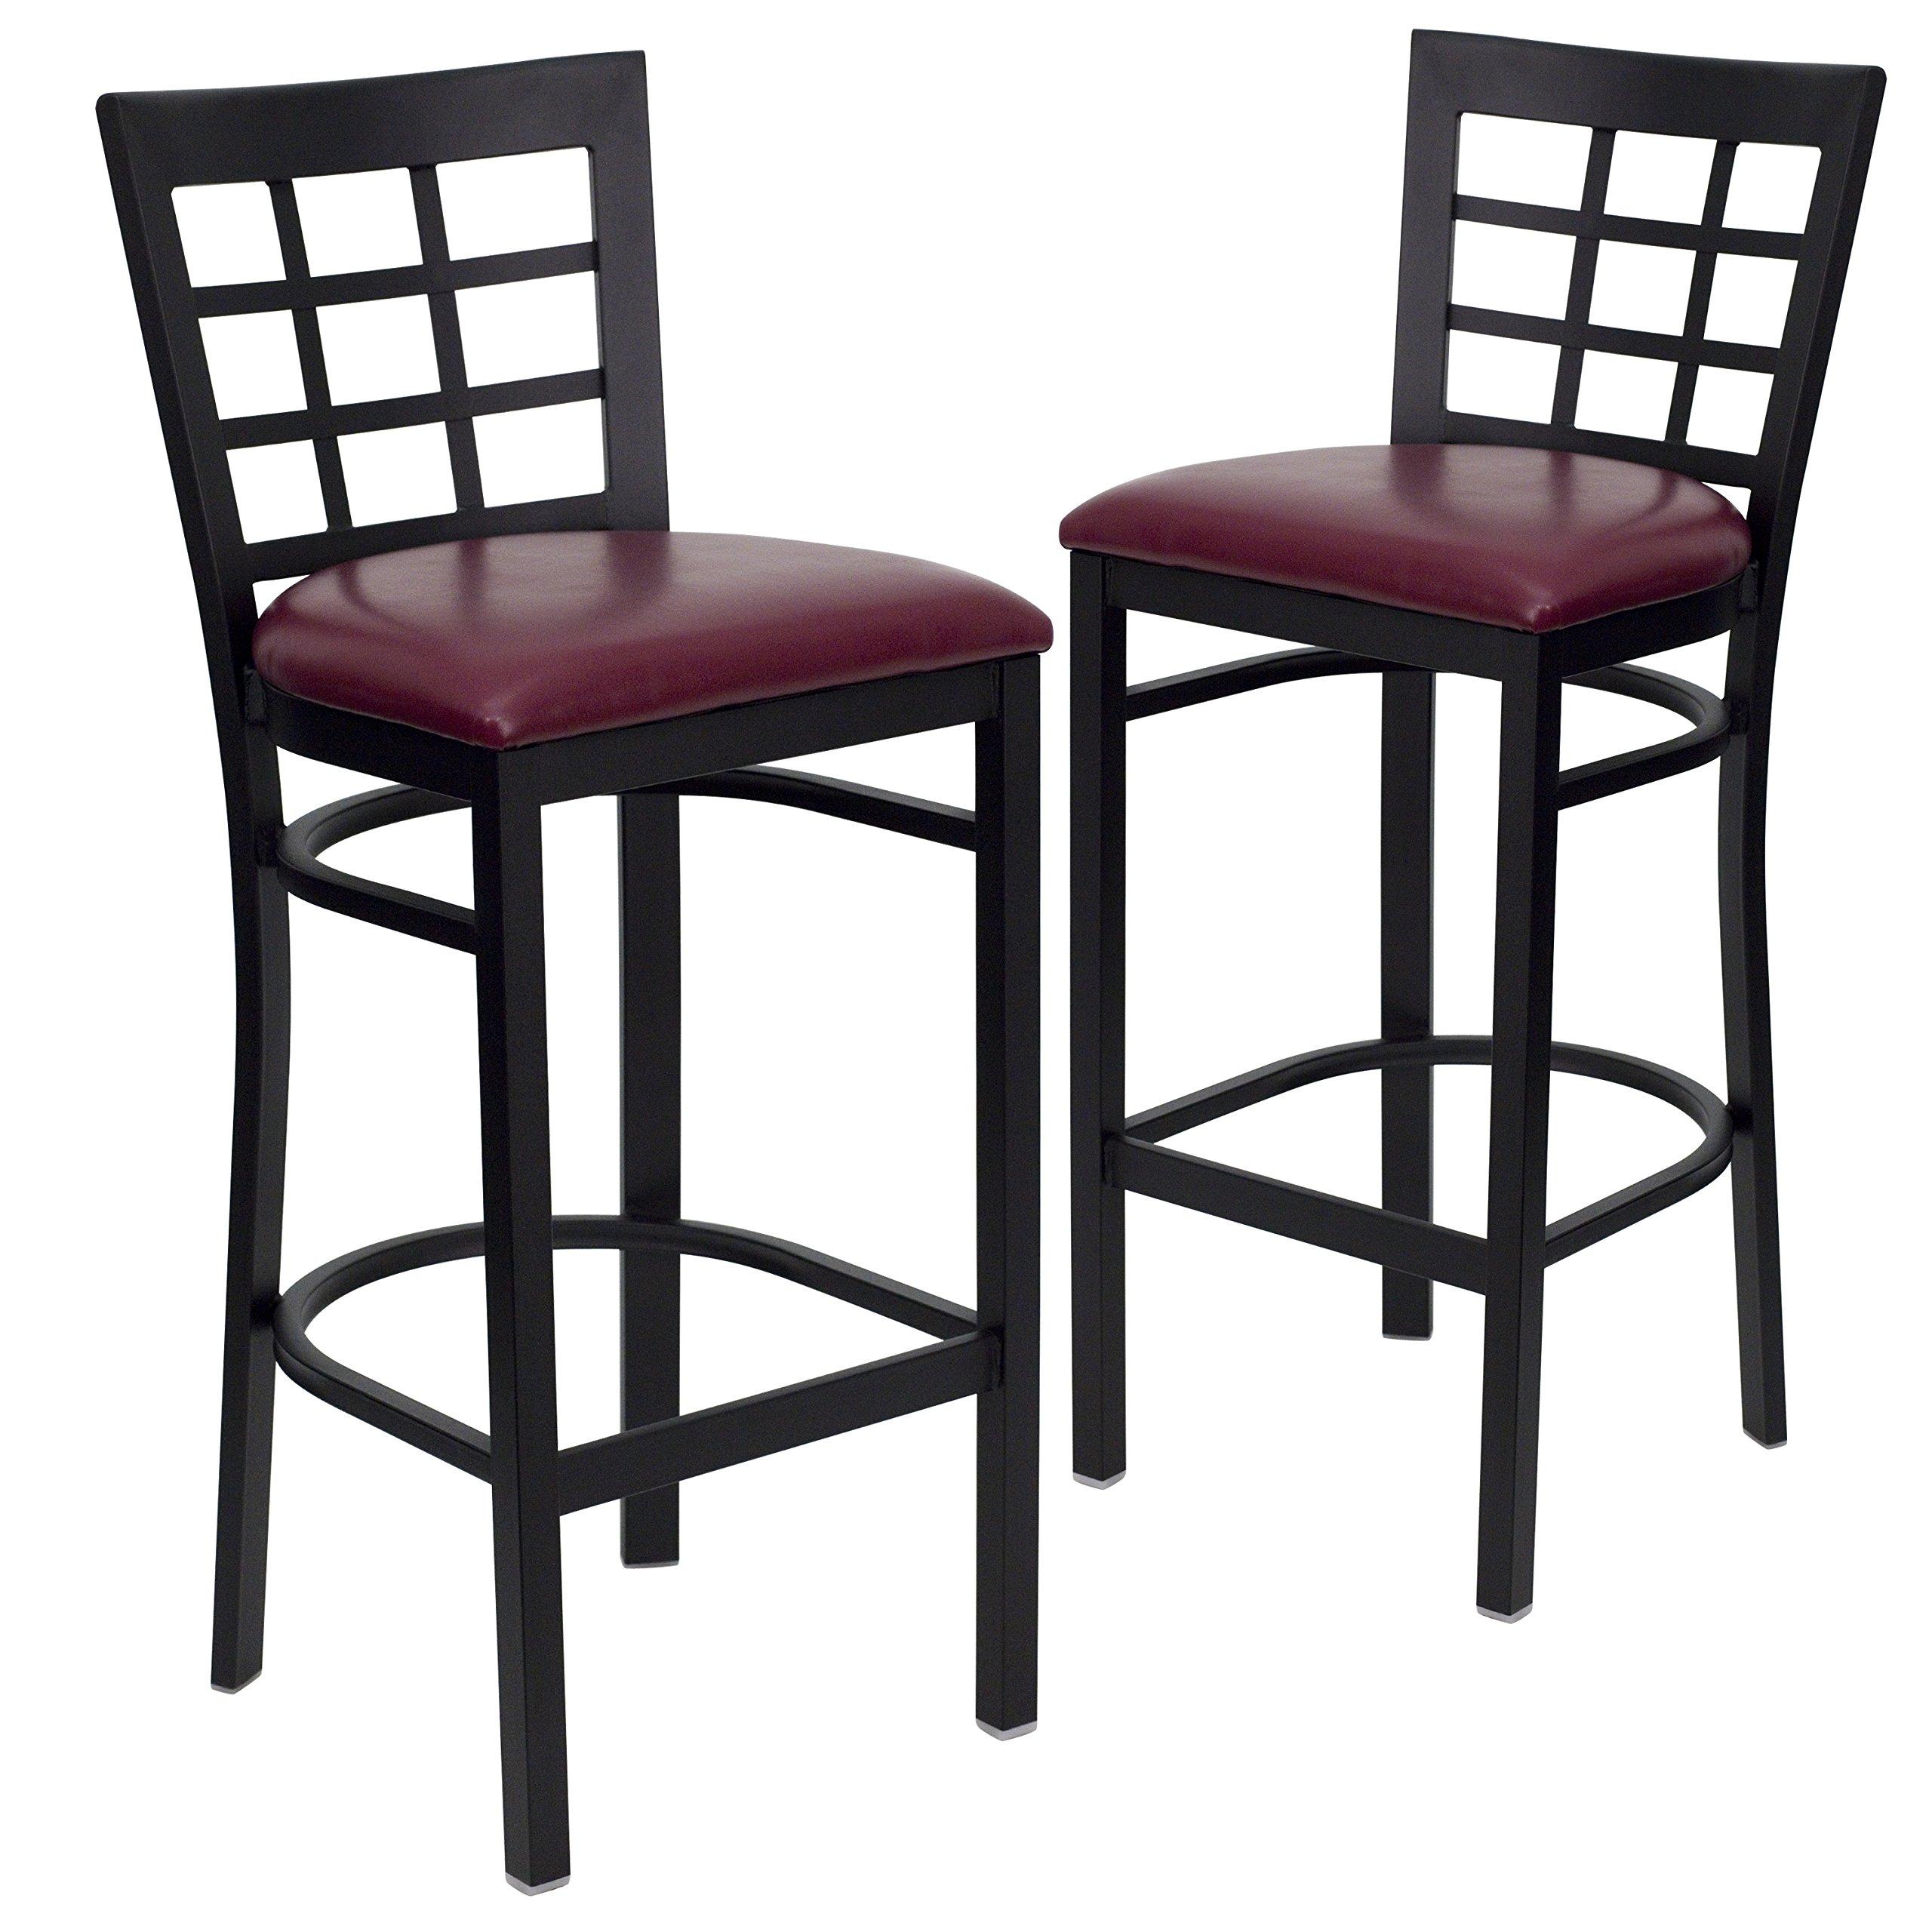 Flash Furniture 2 Pk. HERCULES Series Black Window Back Metal Restaurant Barstool - Burgundy Vinyl Seat